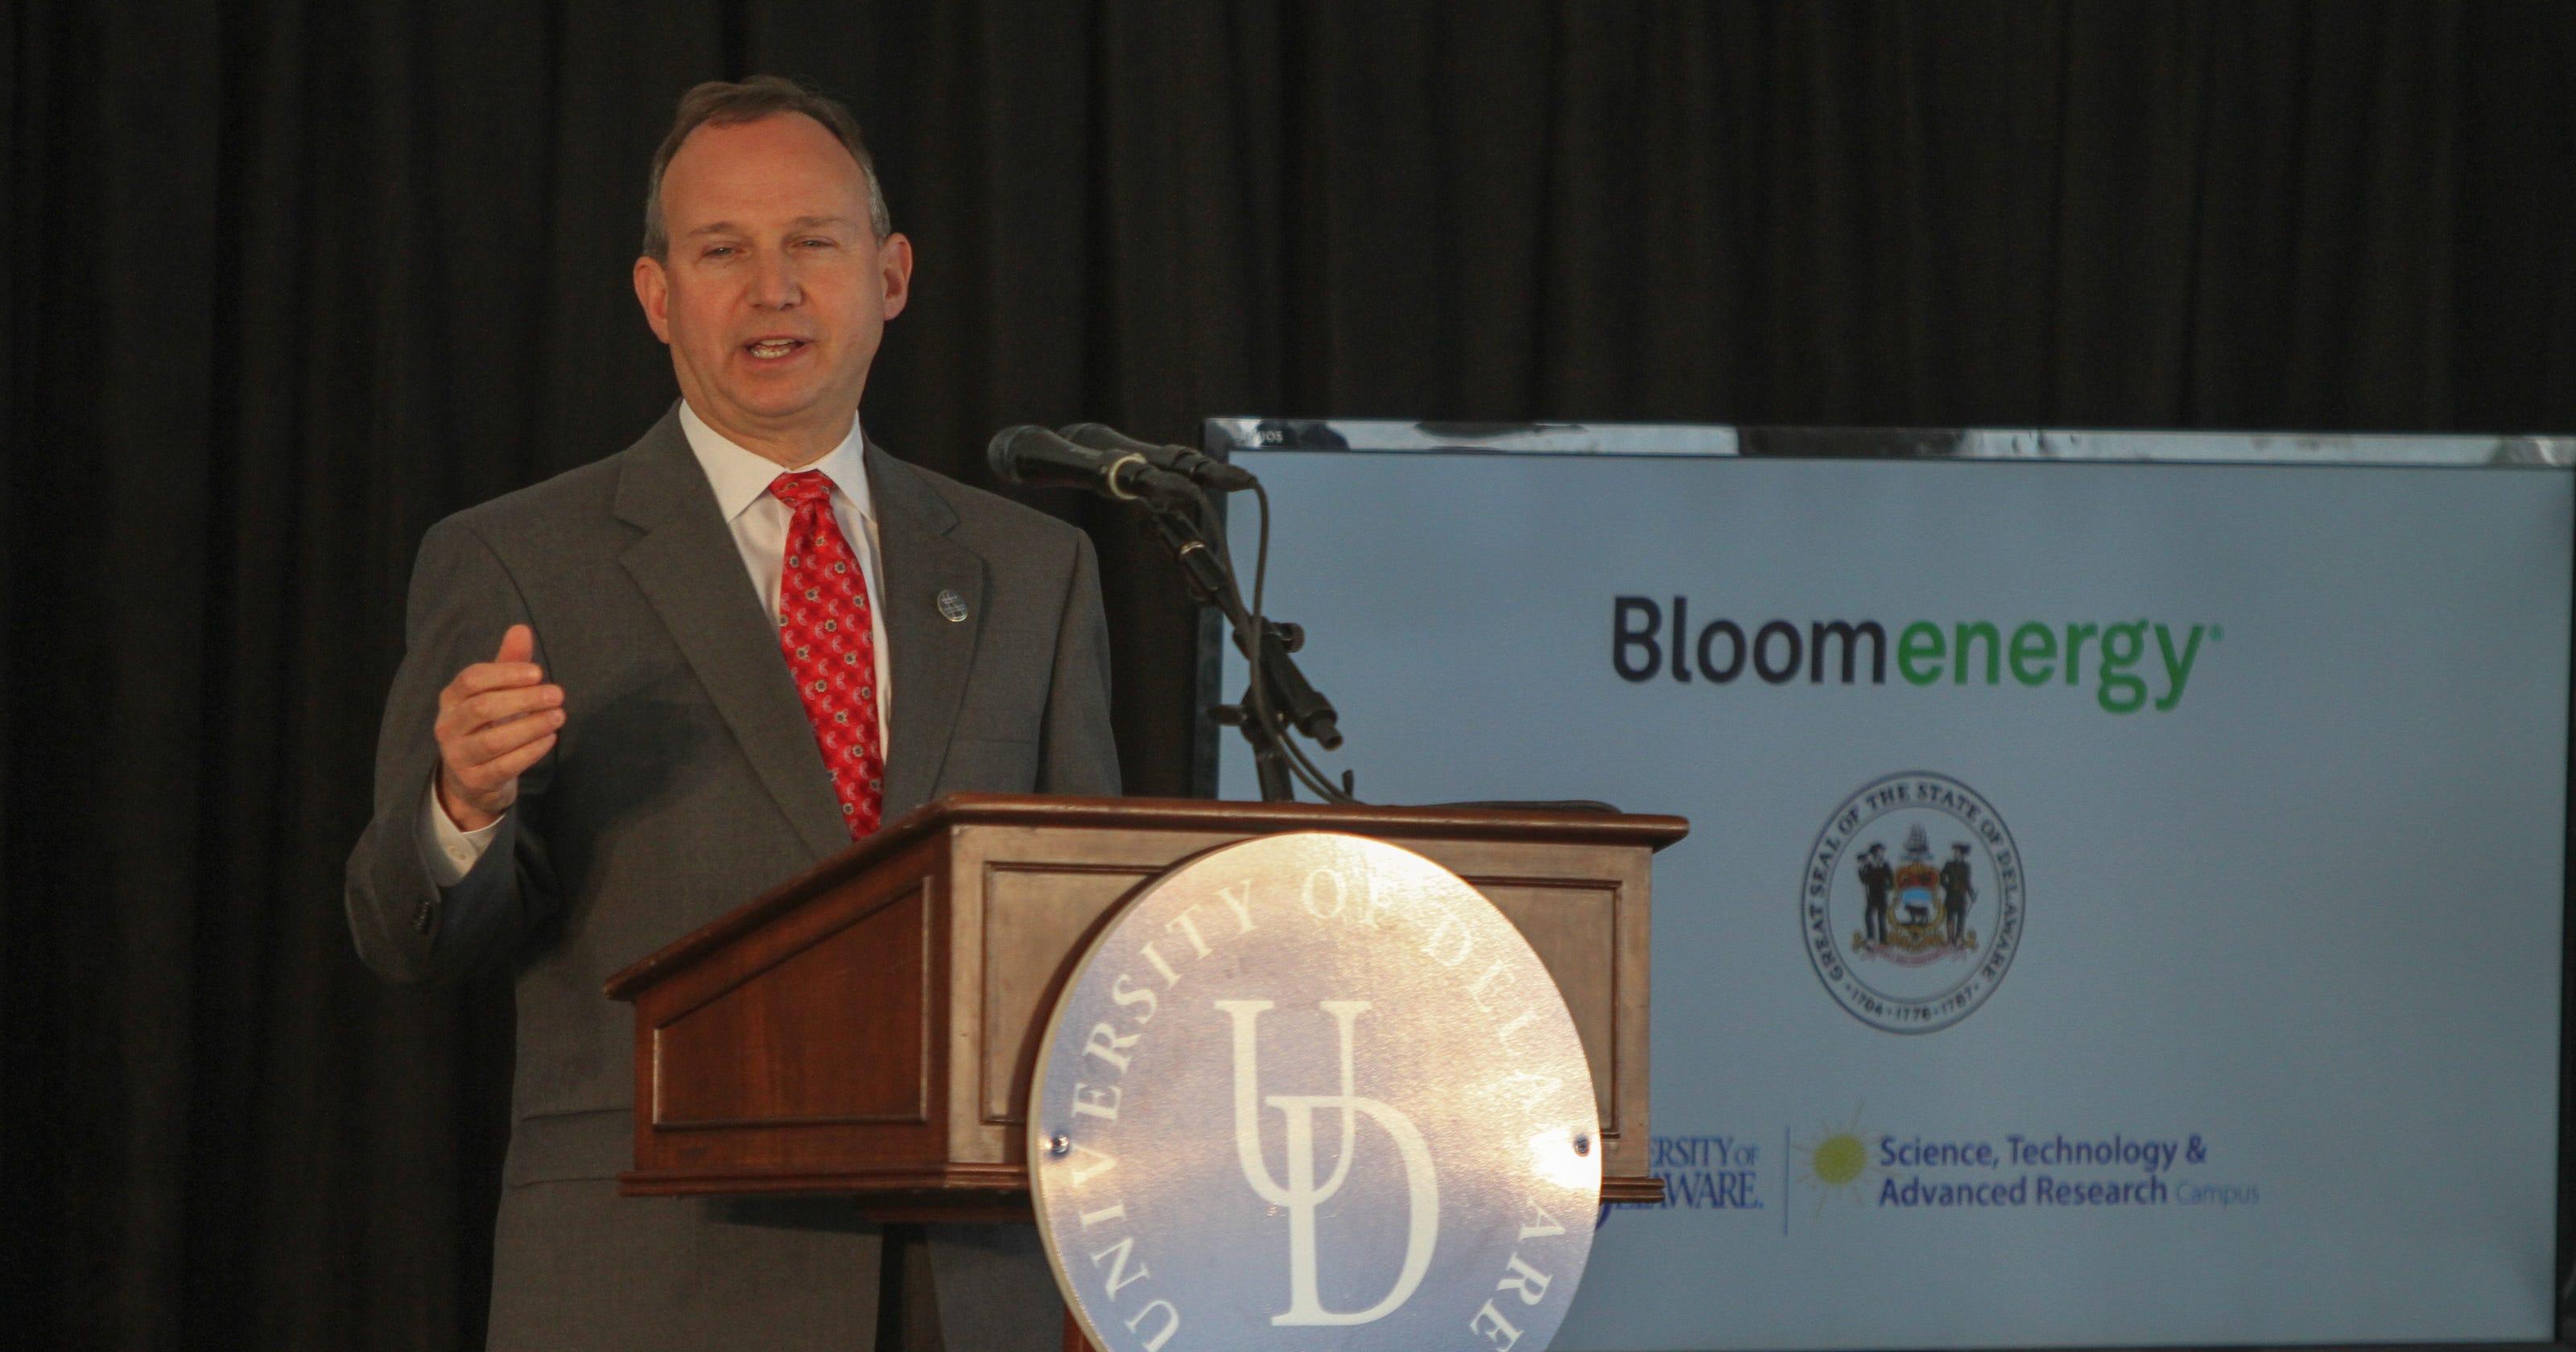 The Truth Behind Bloom Energys Sweet Deal In Delaware